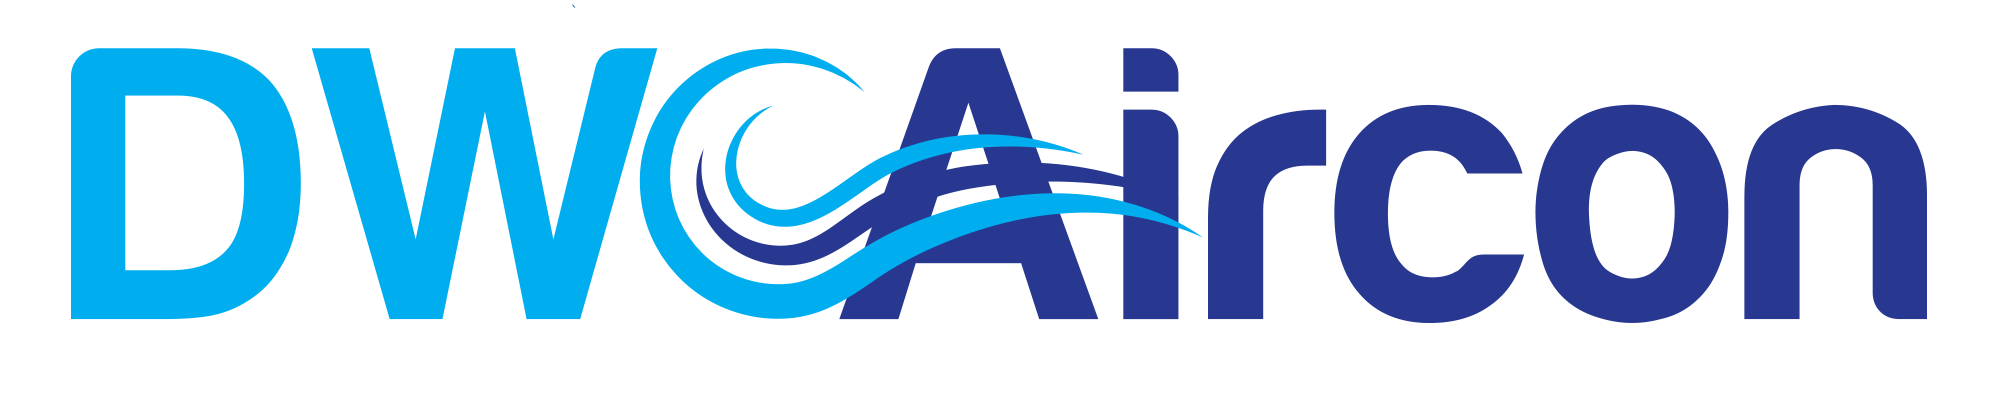 DW-aircon-servicing-singapore-logo